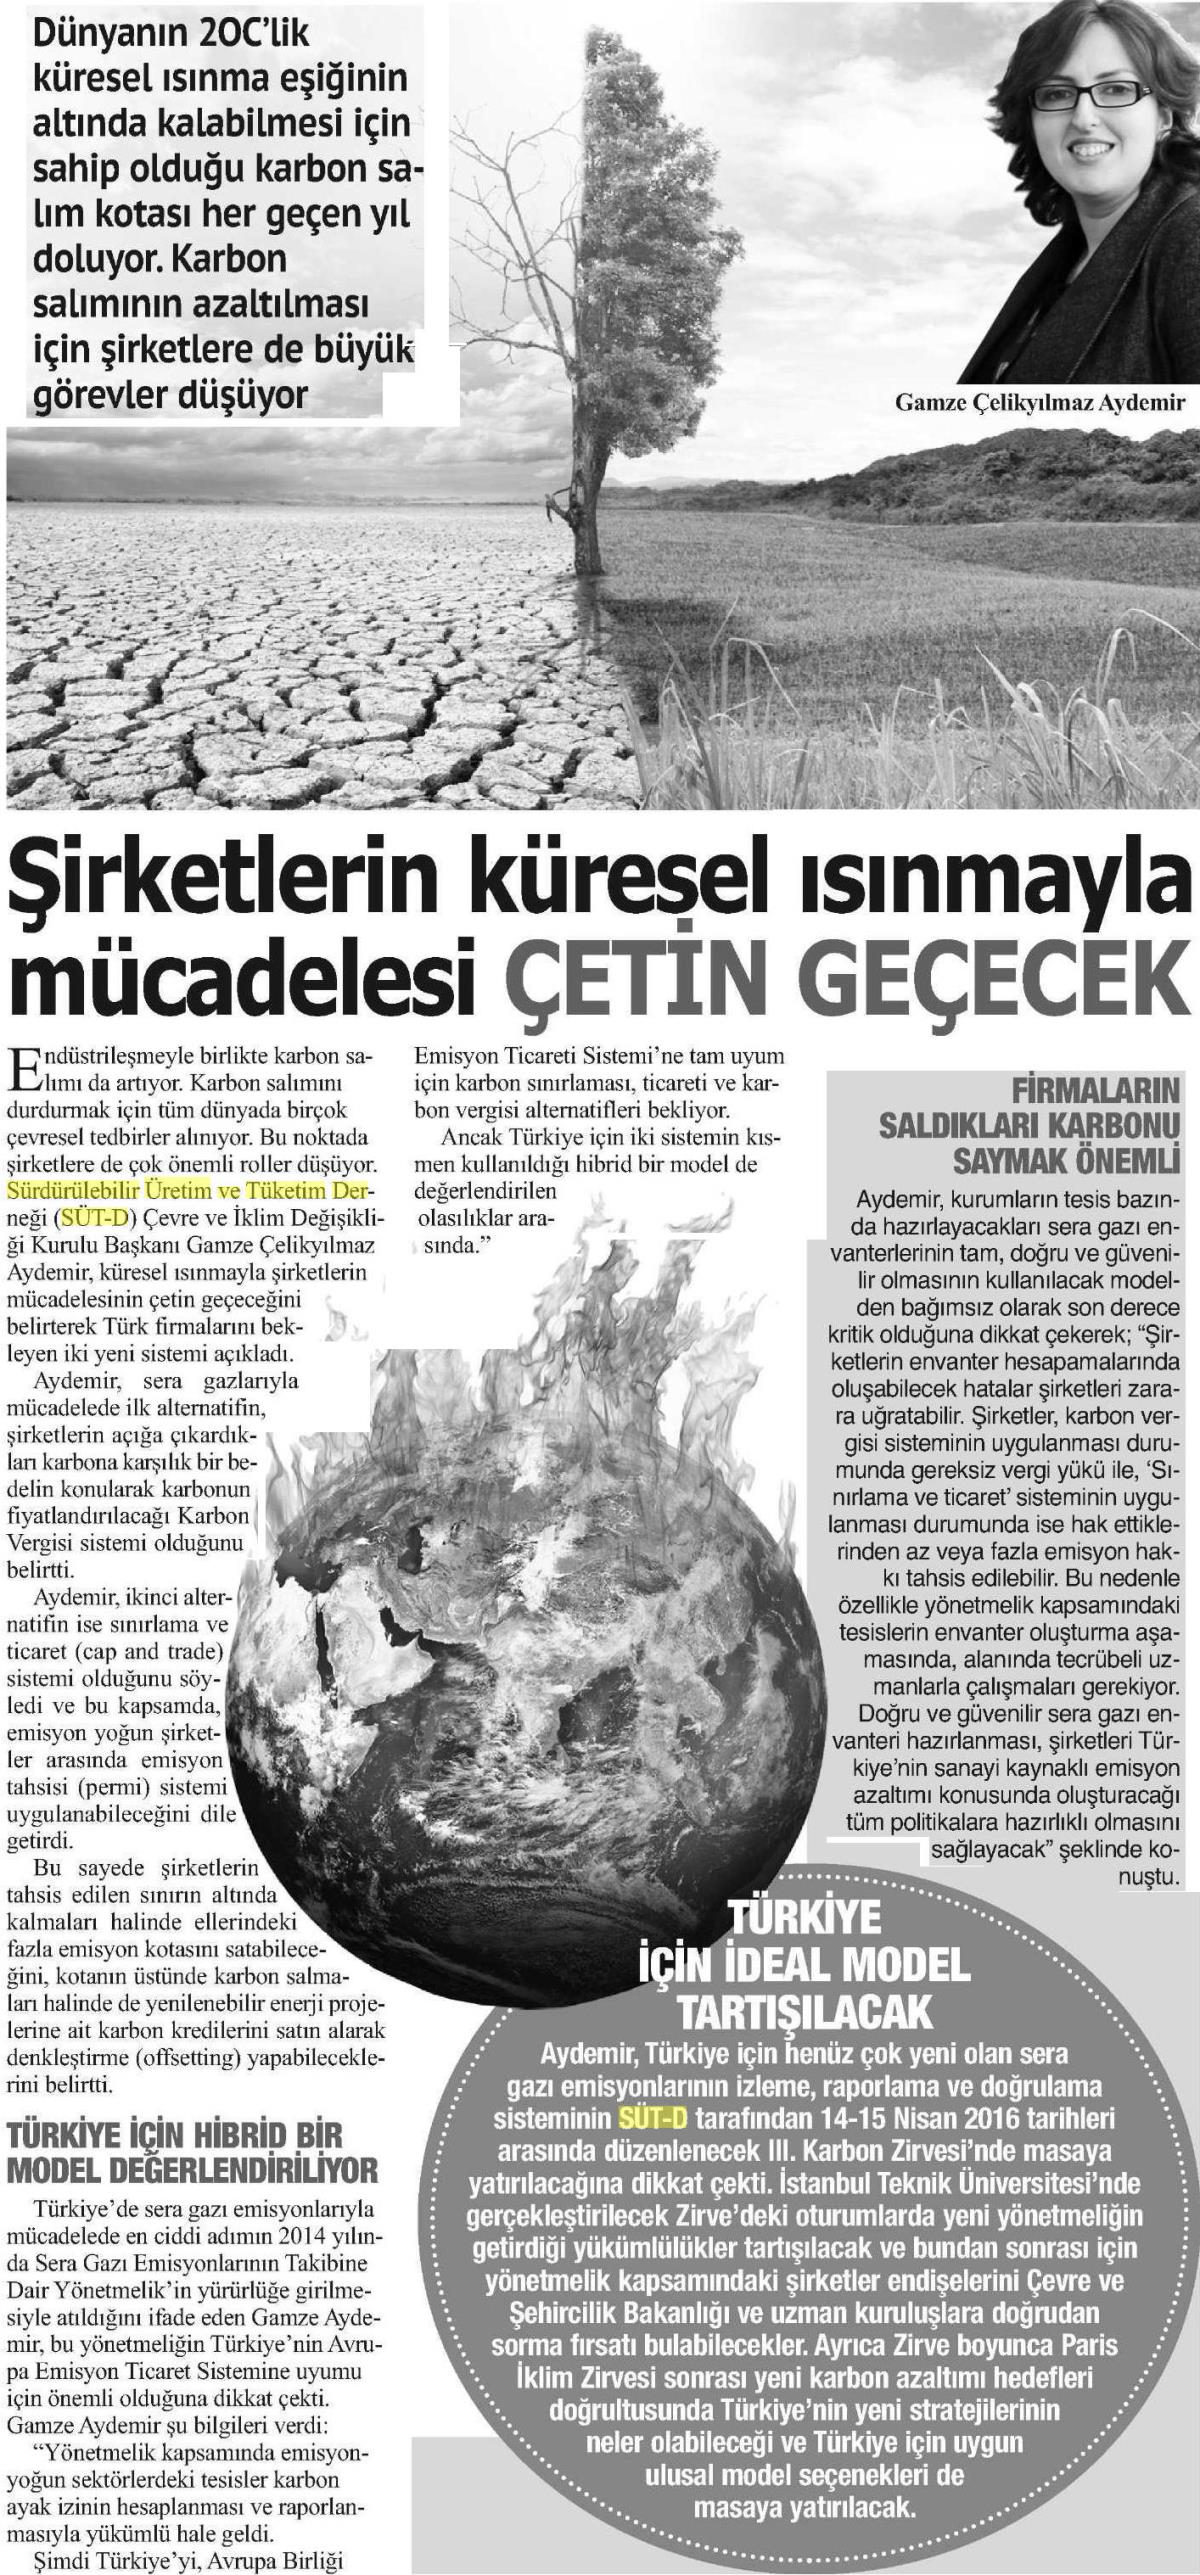 Bizim Anadolu 05.03.2016